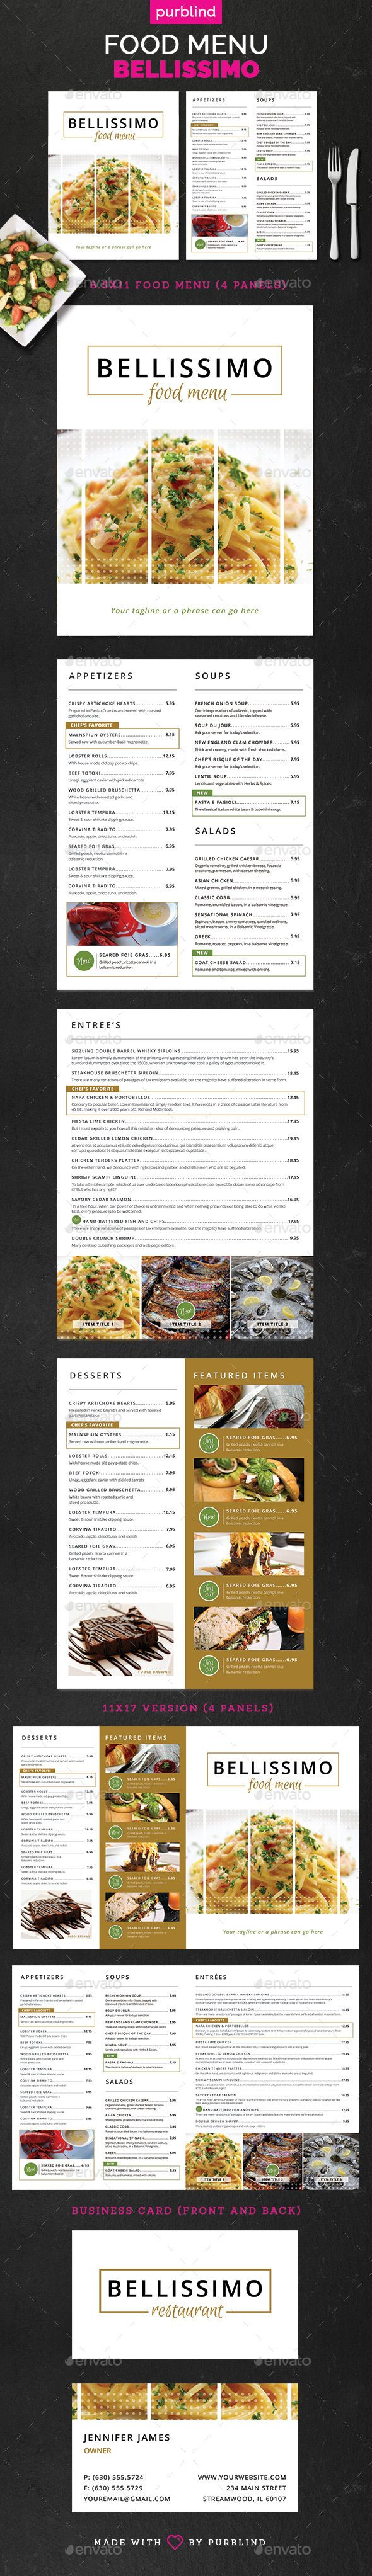 Restaurant Menu Set - Bellissimo Template PSD #design Download: http://graphicriver.net/item/restaurant-menu-set-bellissimo/13276115?ref=ksioks